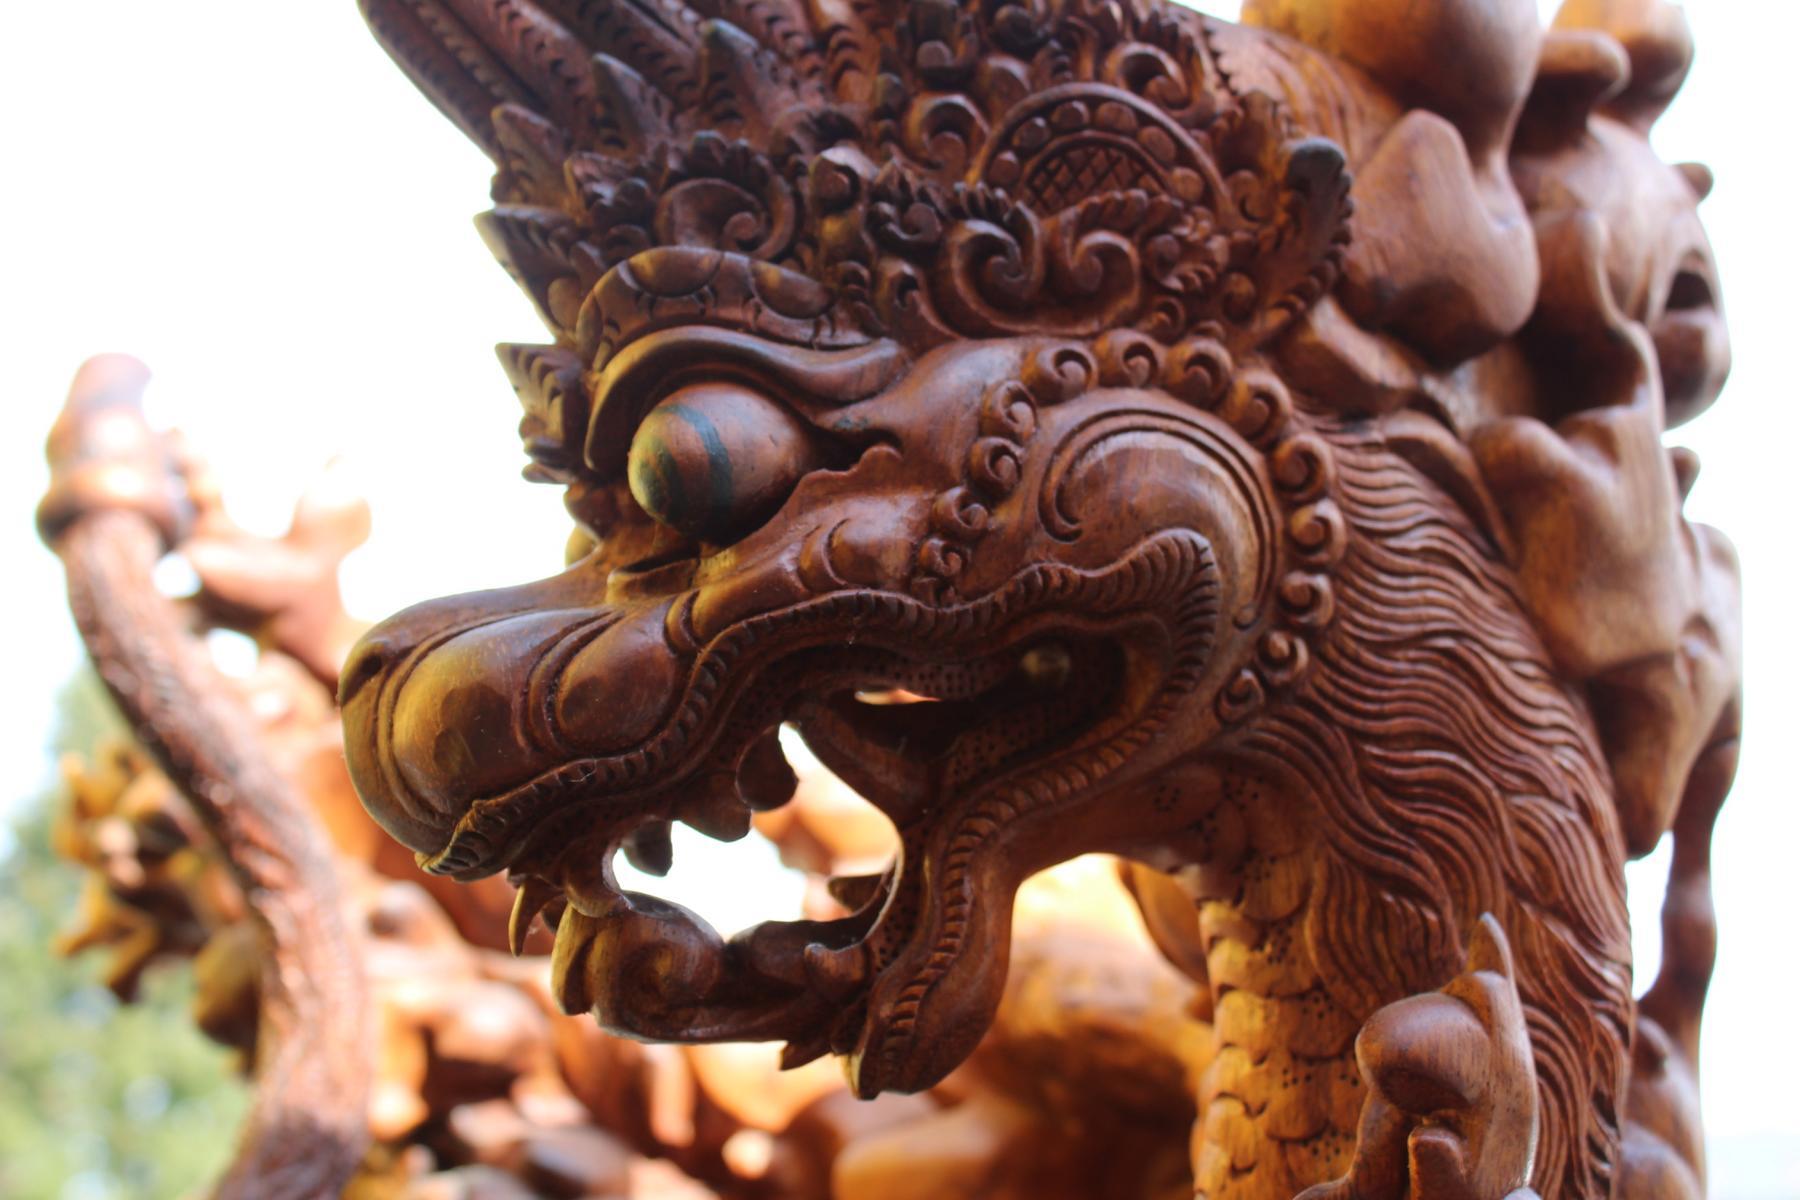 Große Holzskulptur, Indonesien / Bali, 2. Hälfte 20. Jahrhundert-11